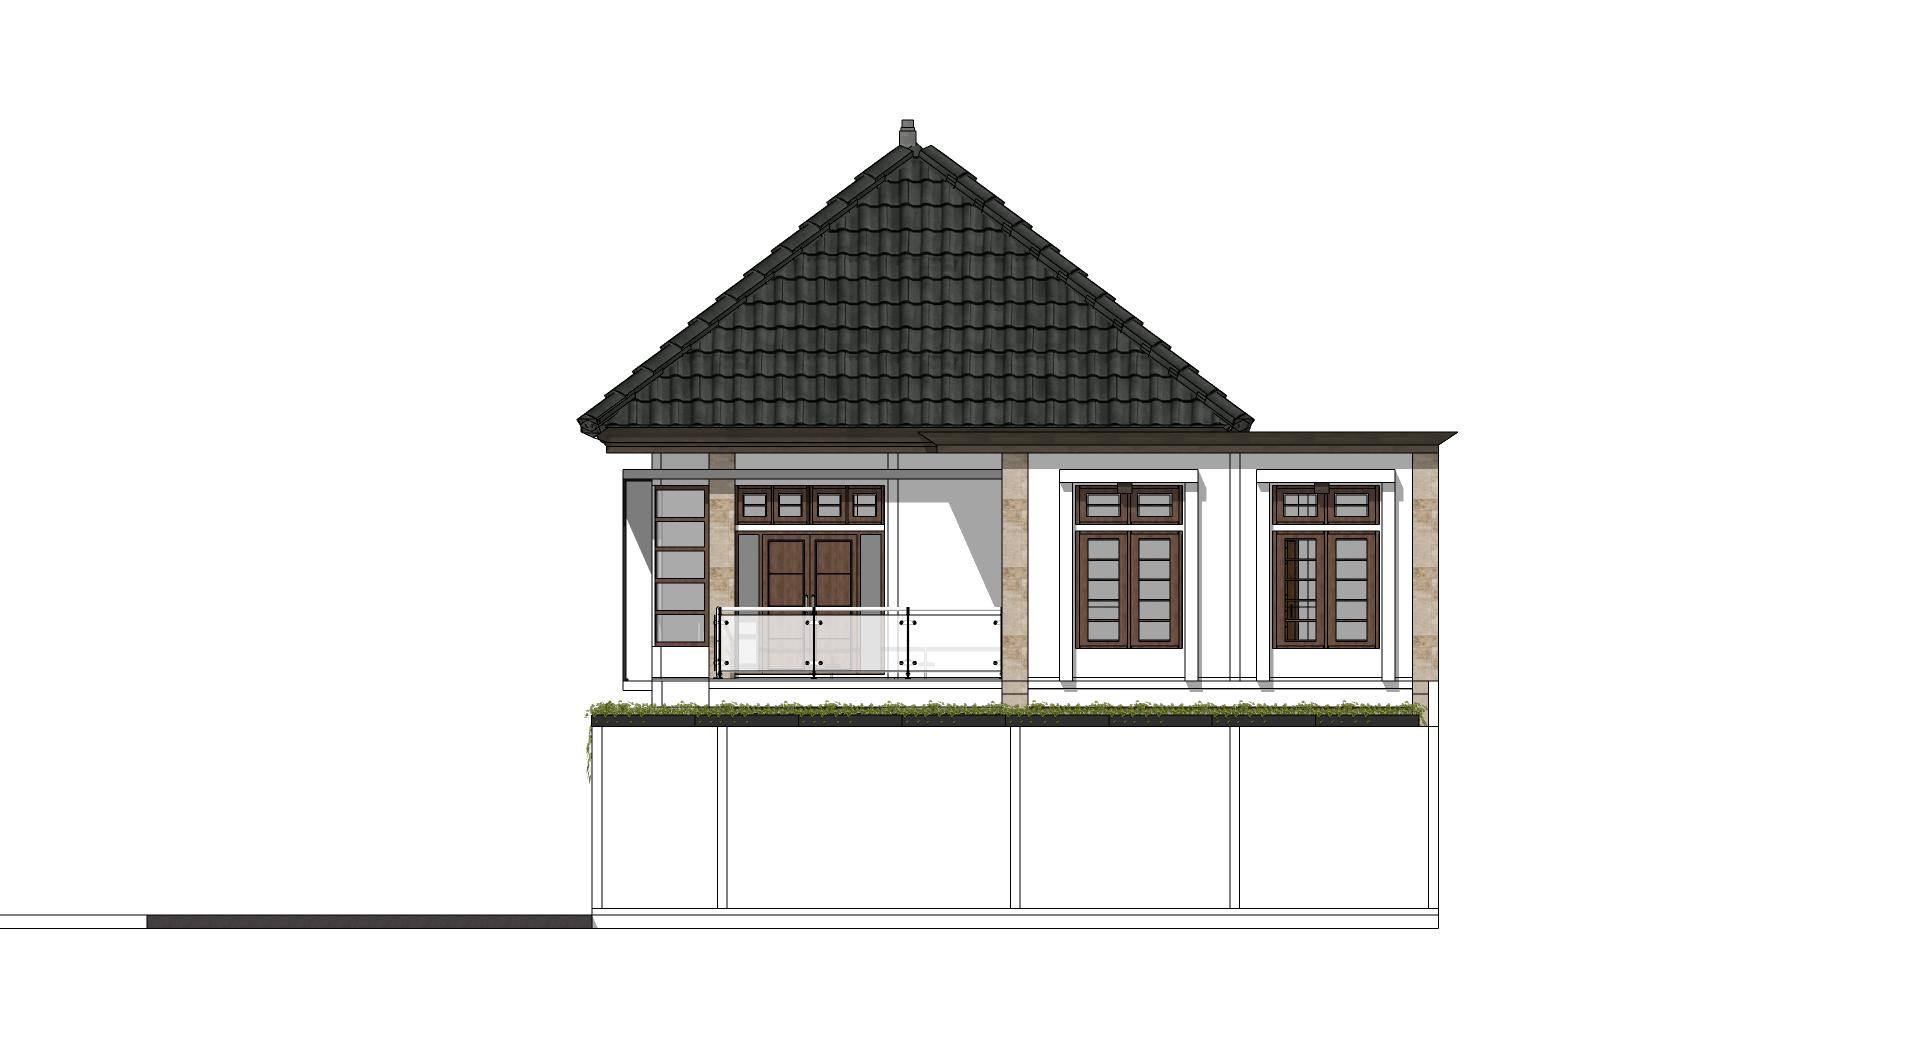 Astabumi Studio Js House Timor Leste Dili, Timor-Leste Pati, Kec. Pati, Kabupaten Pati, Jawa Tengah, Indonesia Cv-Astabumi-Manunggal-Prakarsa-Js-House-Timor-Leste   119269